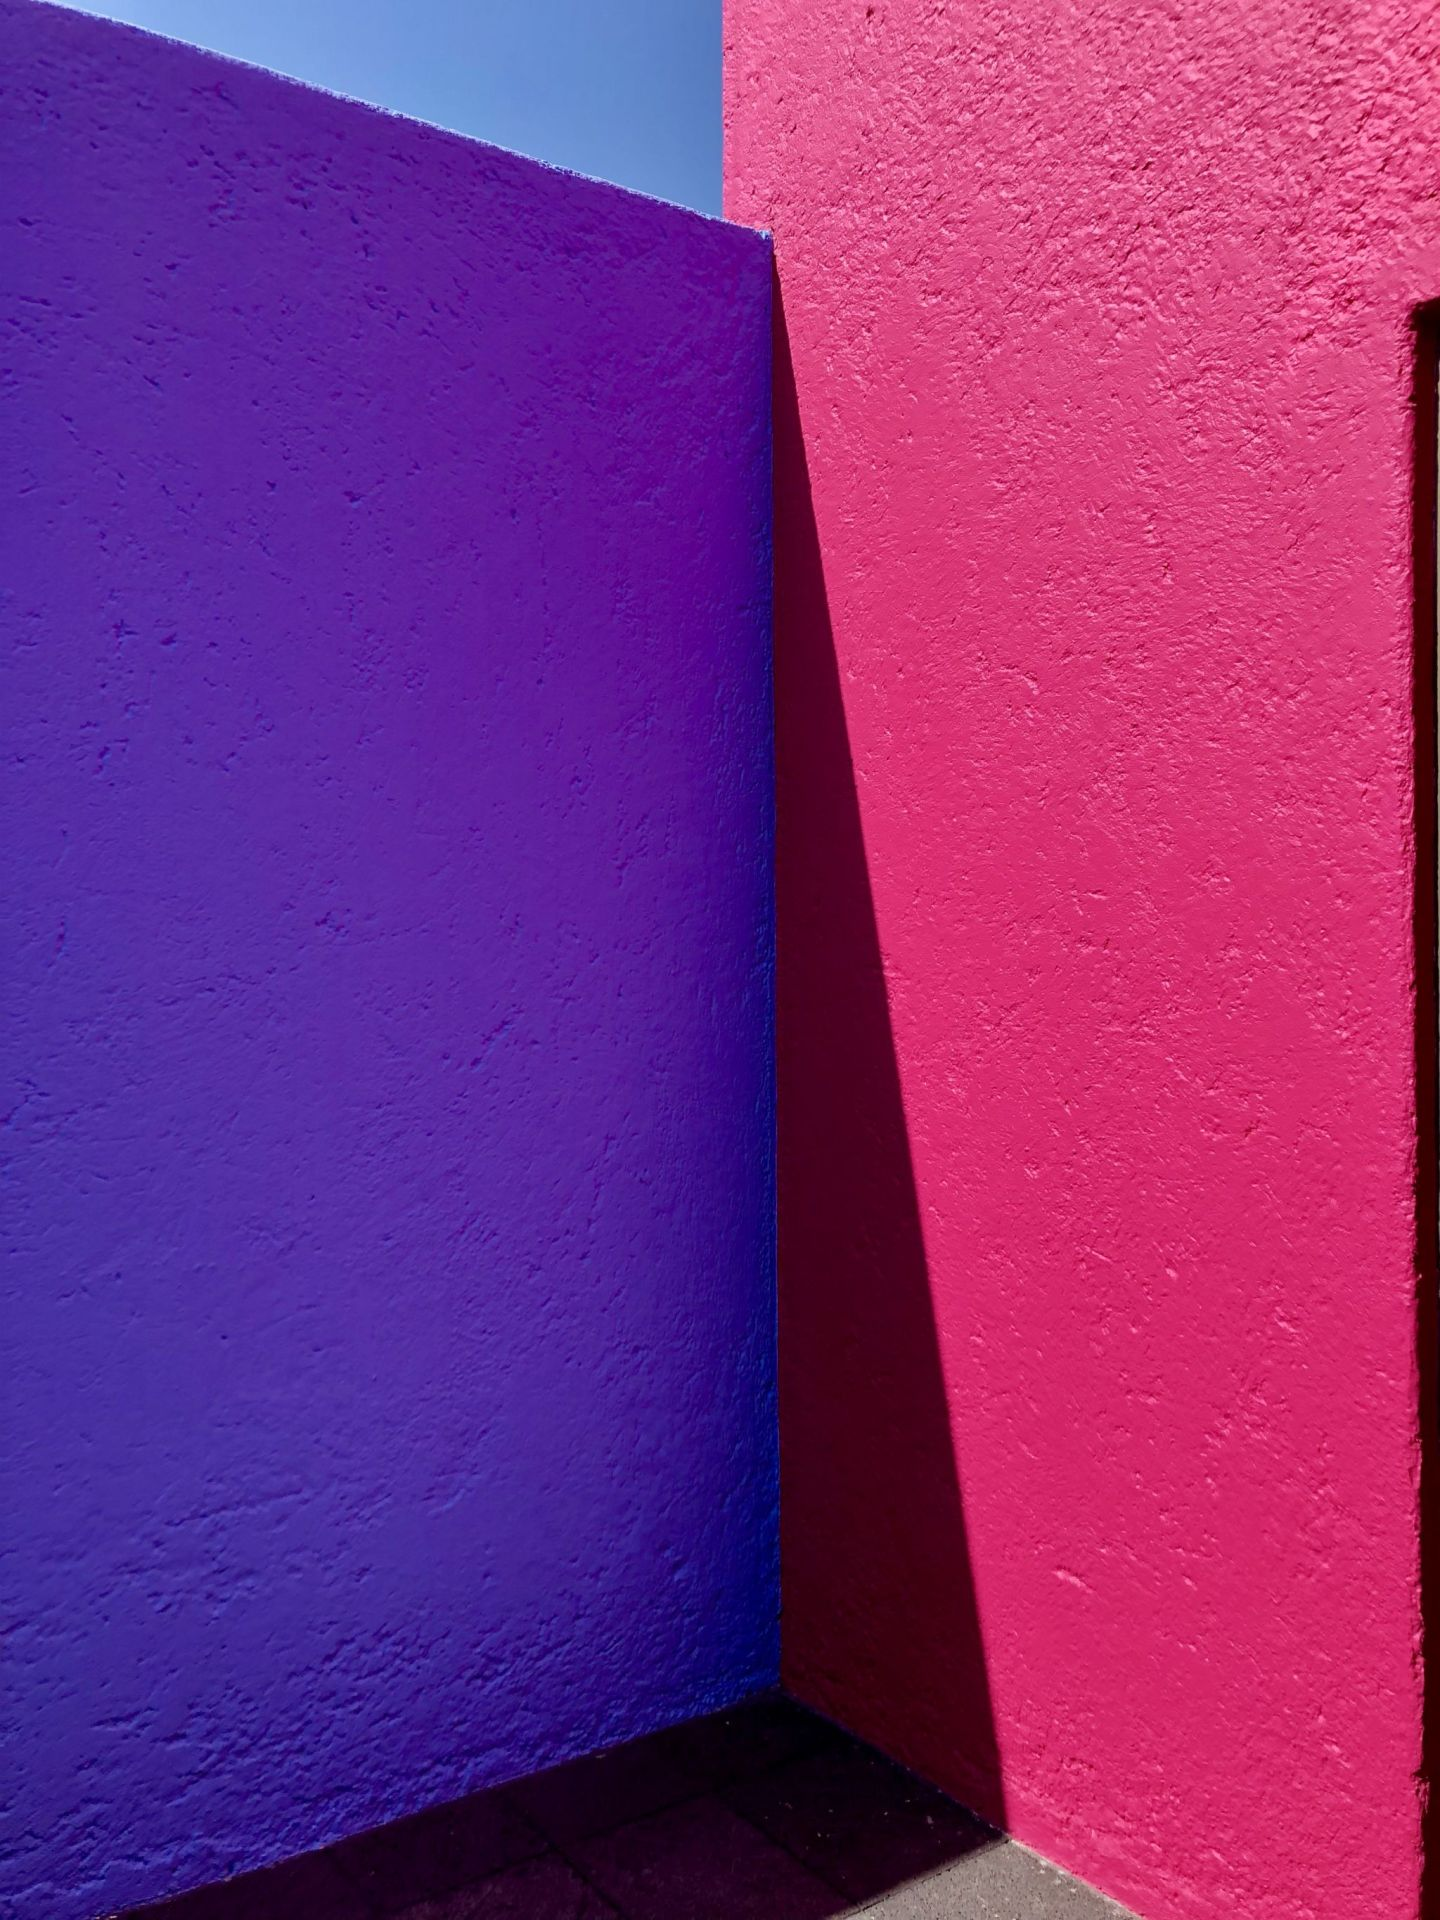 Colourful walls